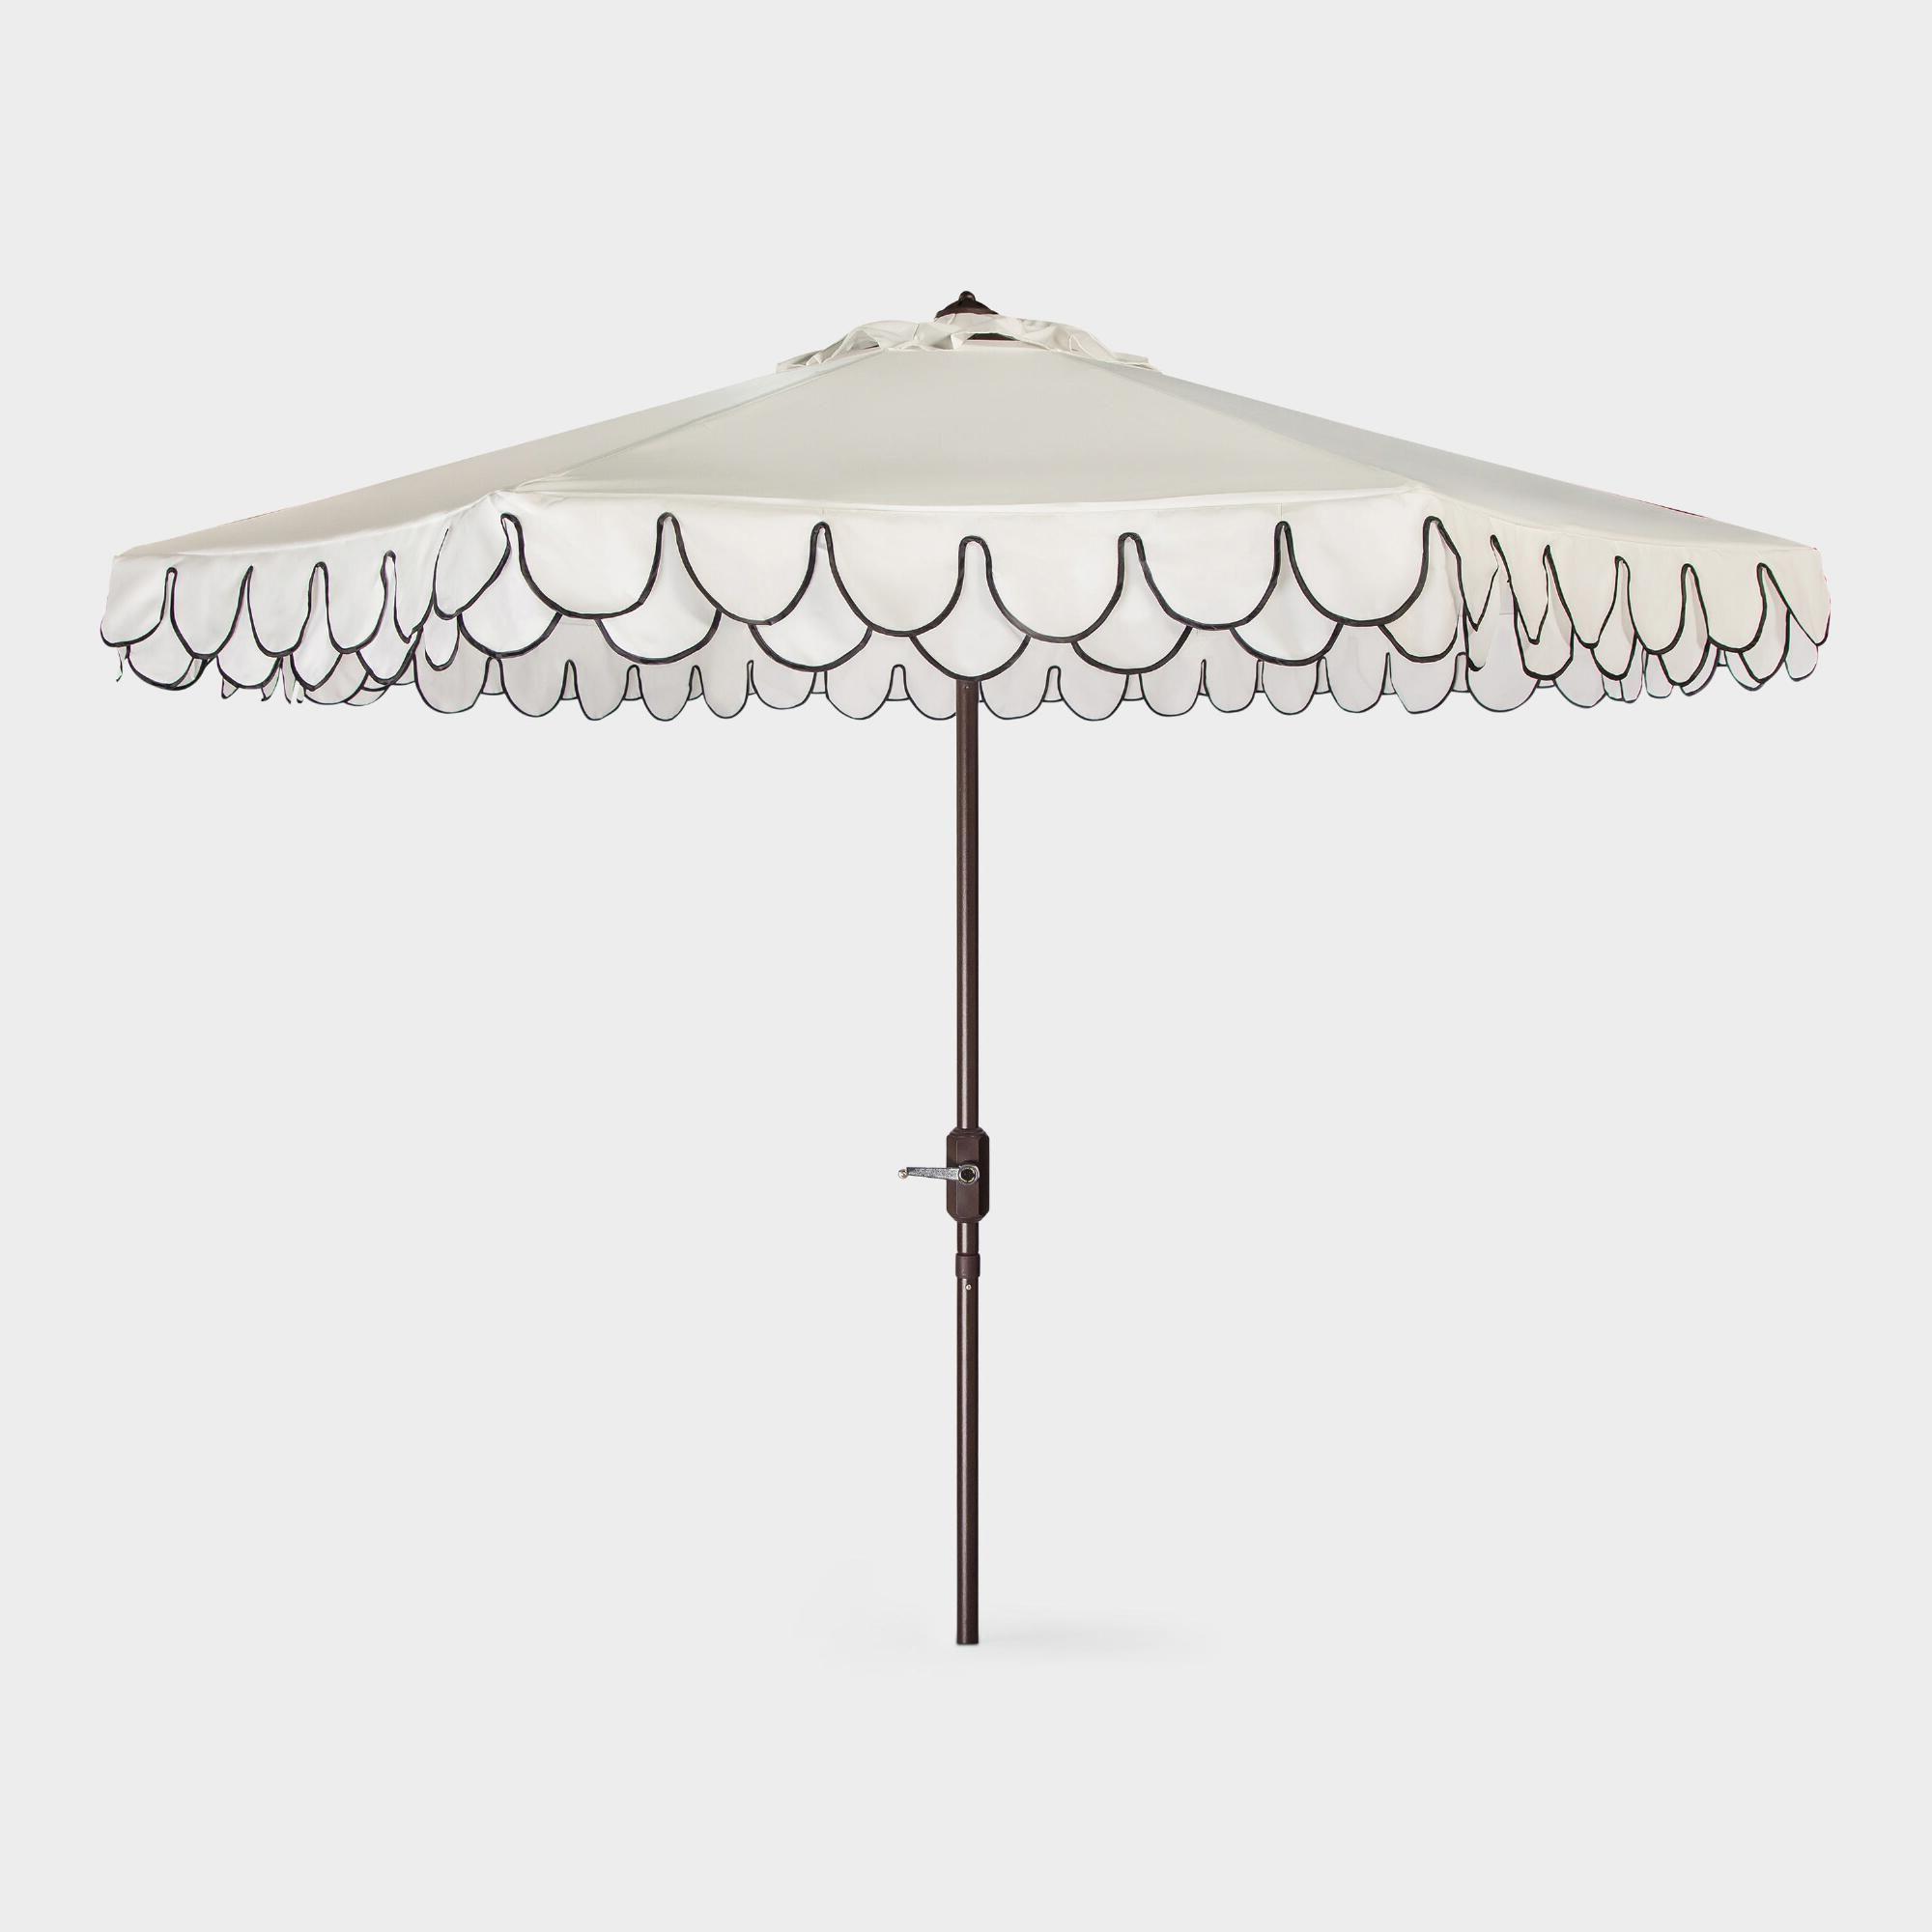 Trendy Lizarraga Market Umbrellas With White And Black Double Scallop 9 Ft Tilting Outdoor Patio Umbrella (View 7 of 20)